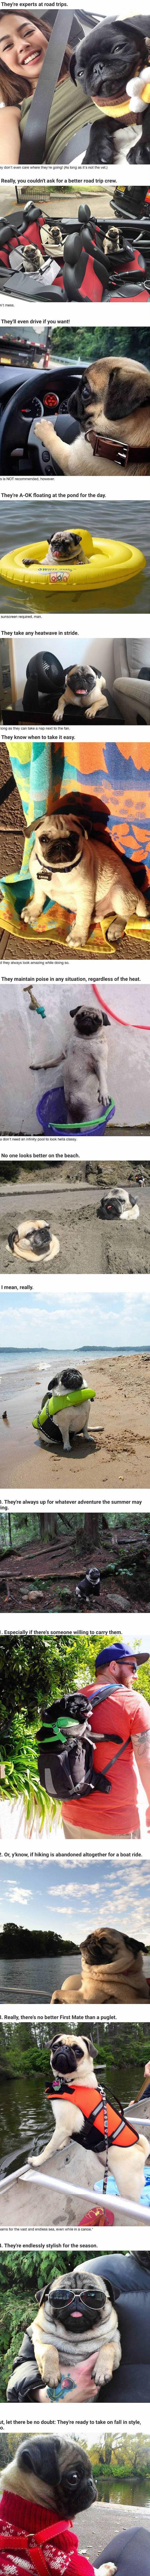 funny-pug-life-dogs-cute